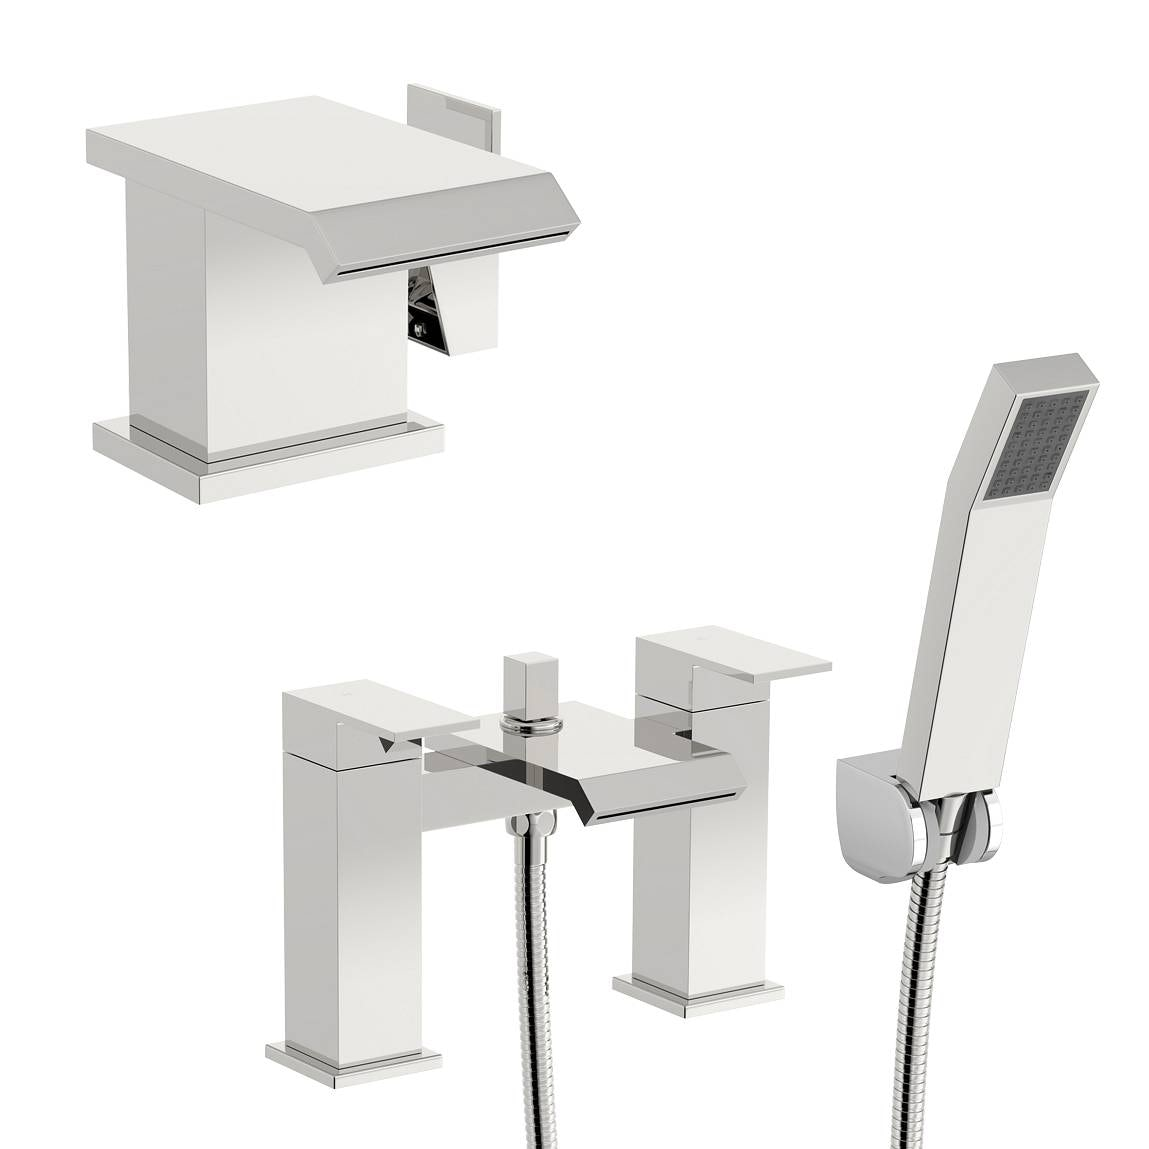 Mode Aurora basin and bath shower mixer pack